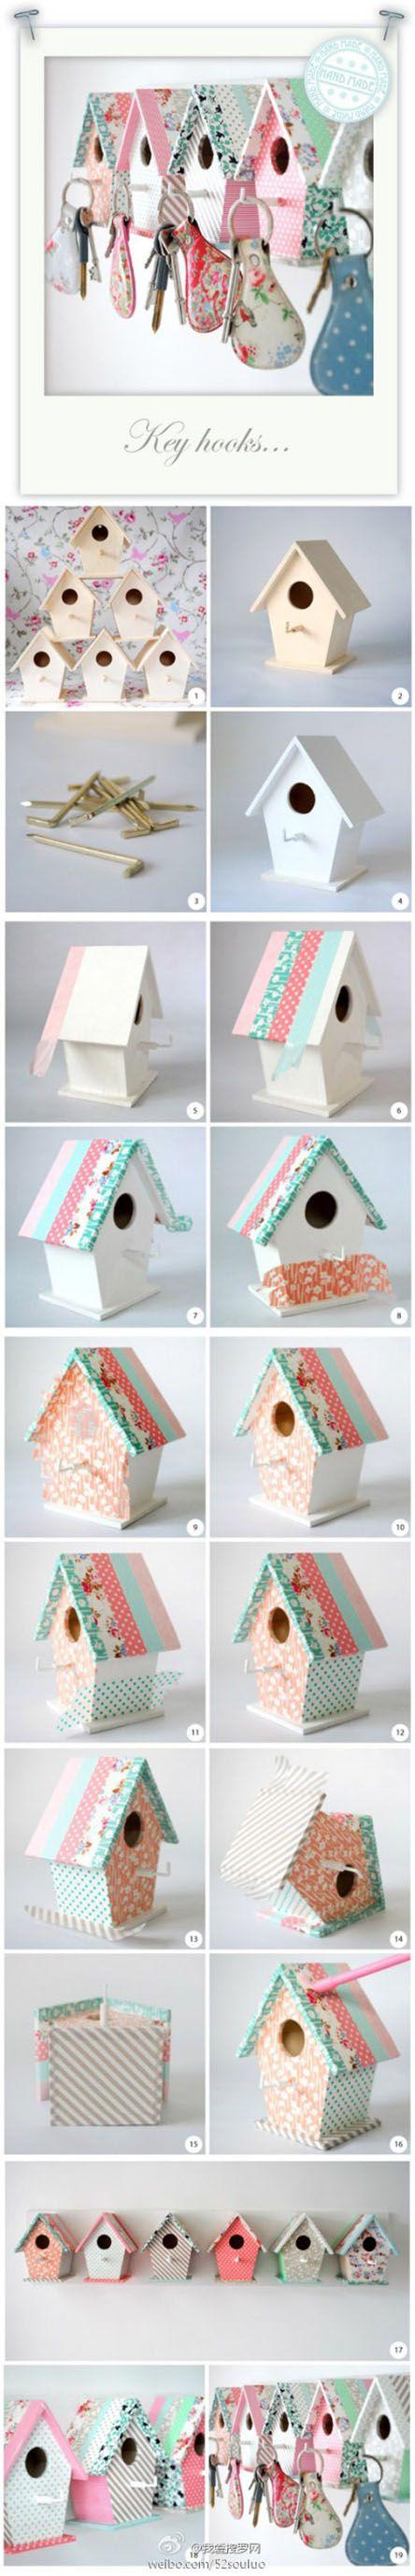 So Cute Craft   DIY & Crafts Tutorials